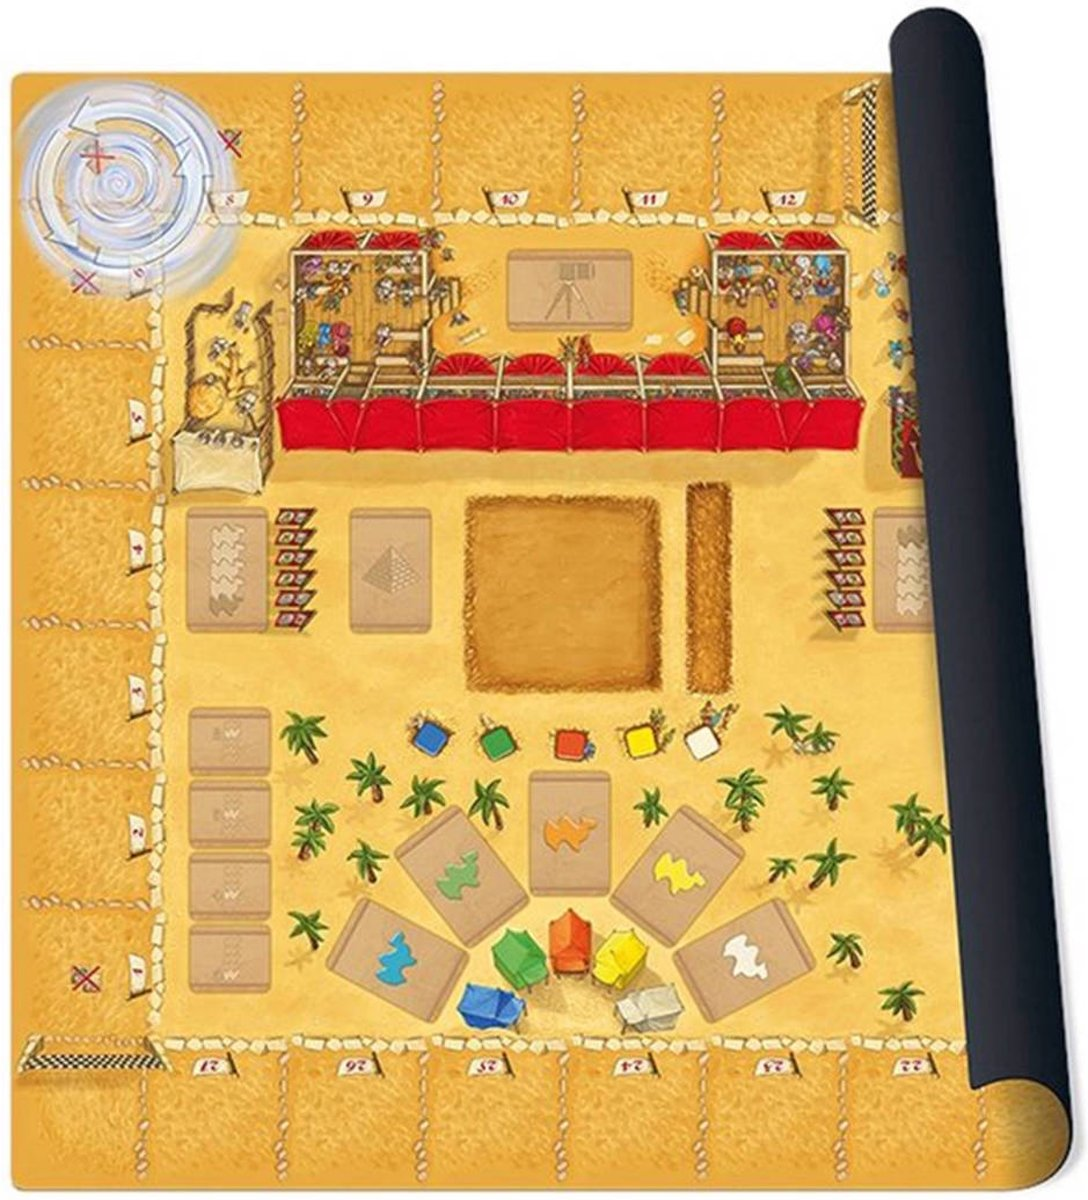 Camel Up playmat Grandprix of the Sahara Bordspel Speelmat